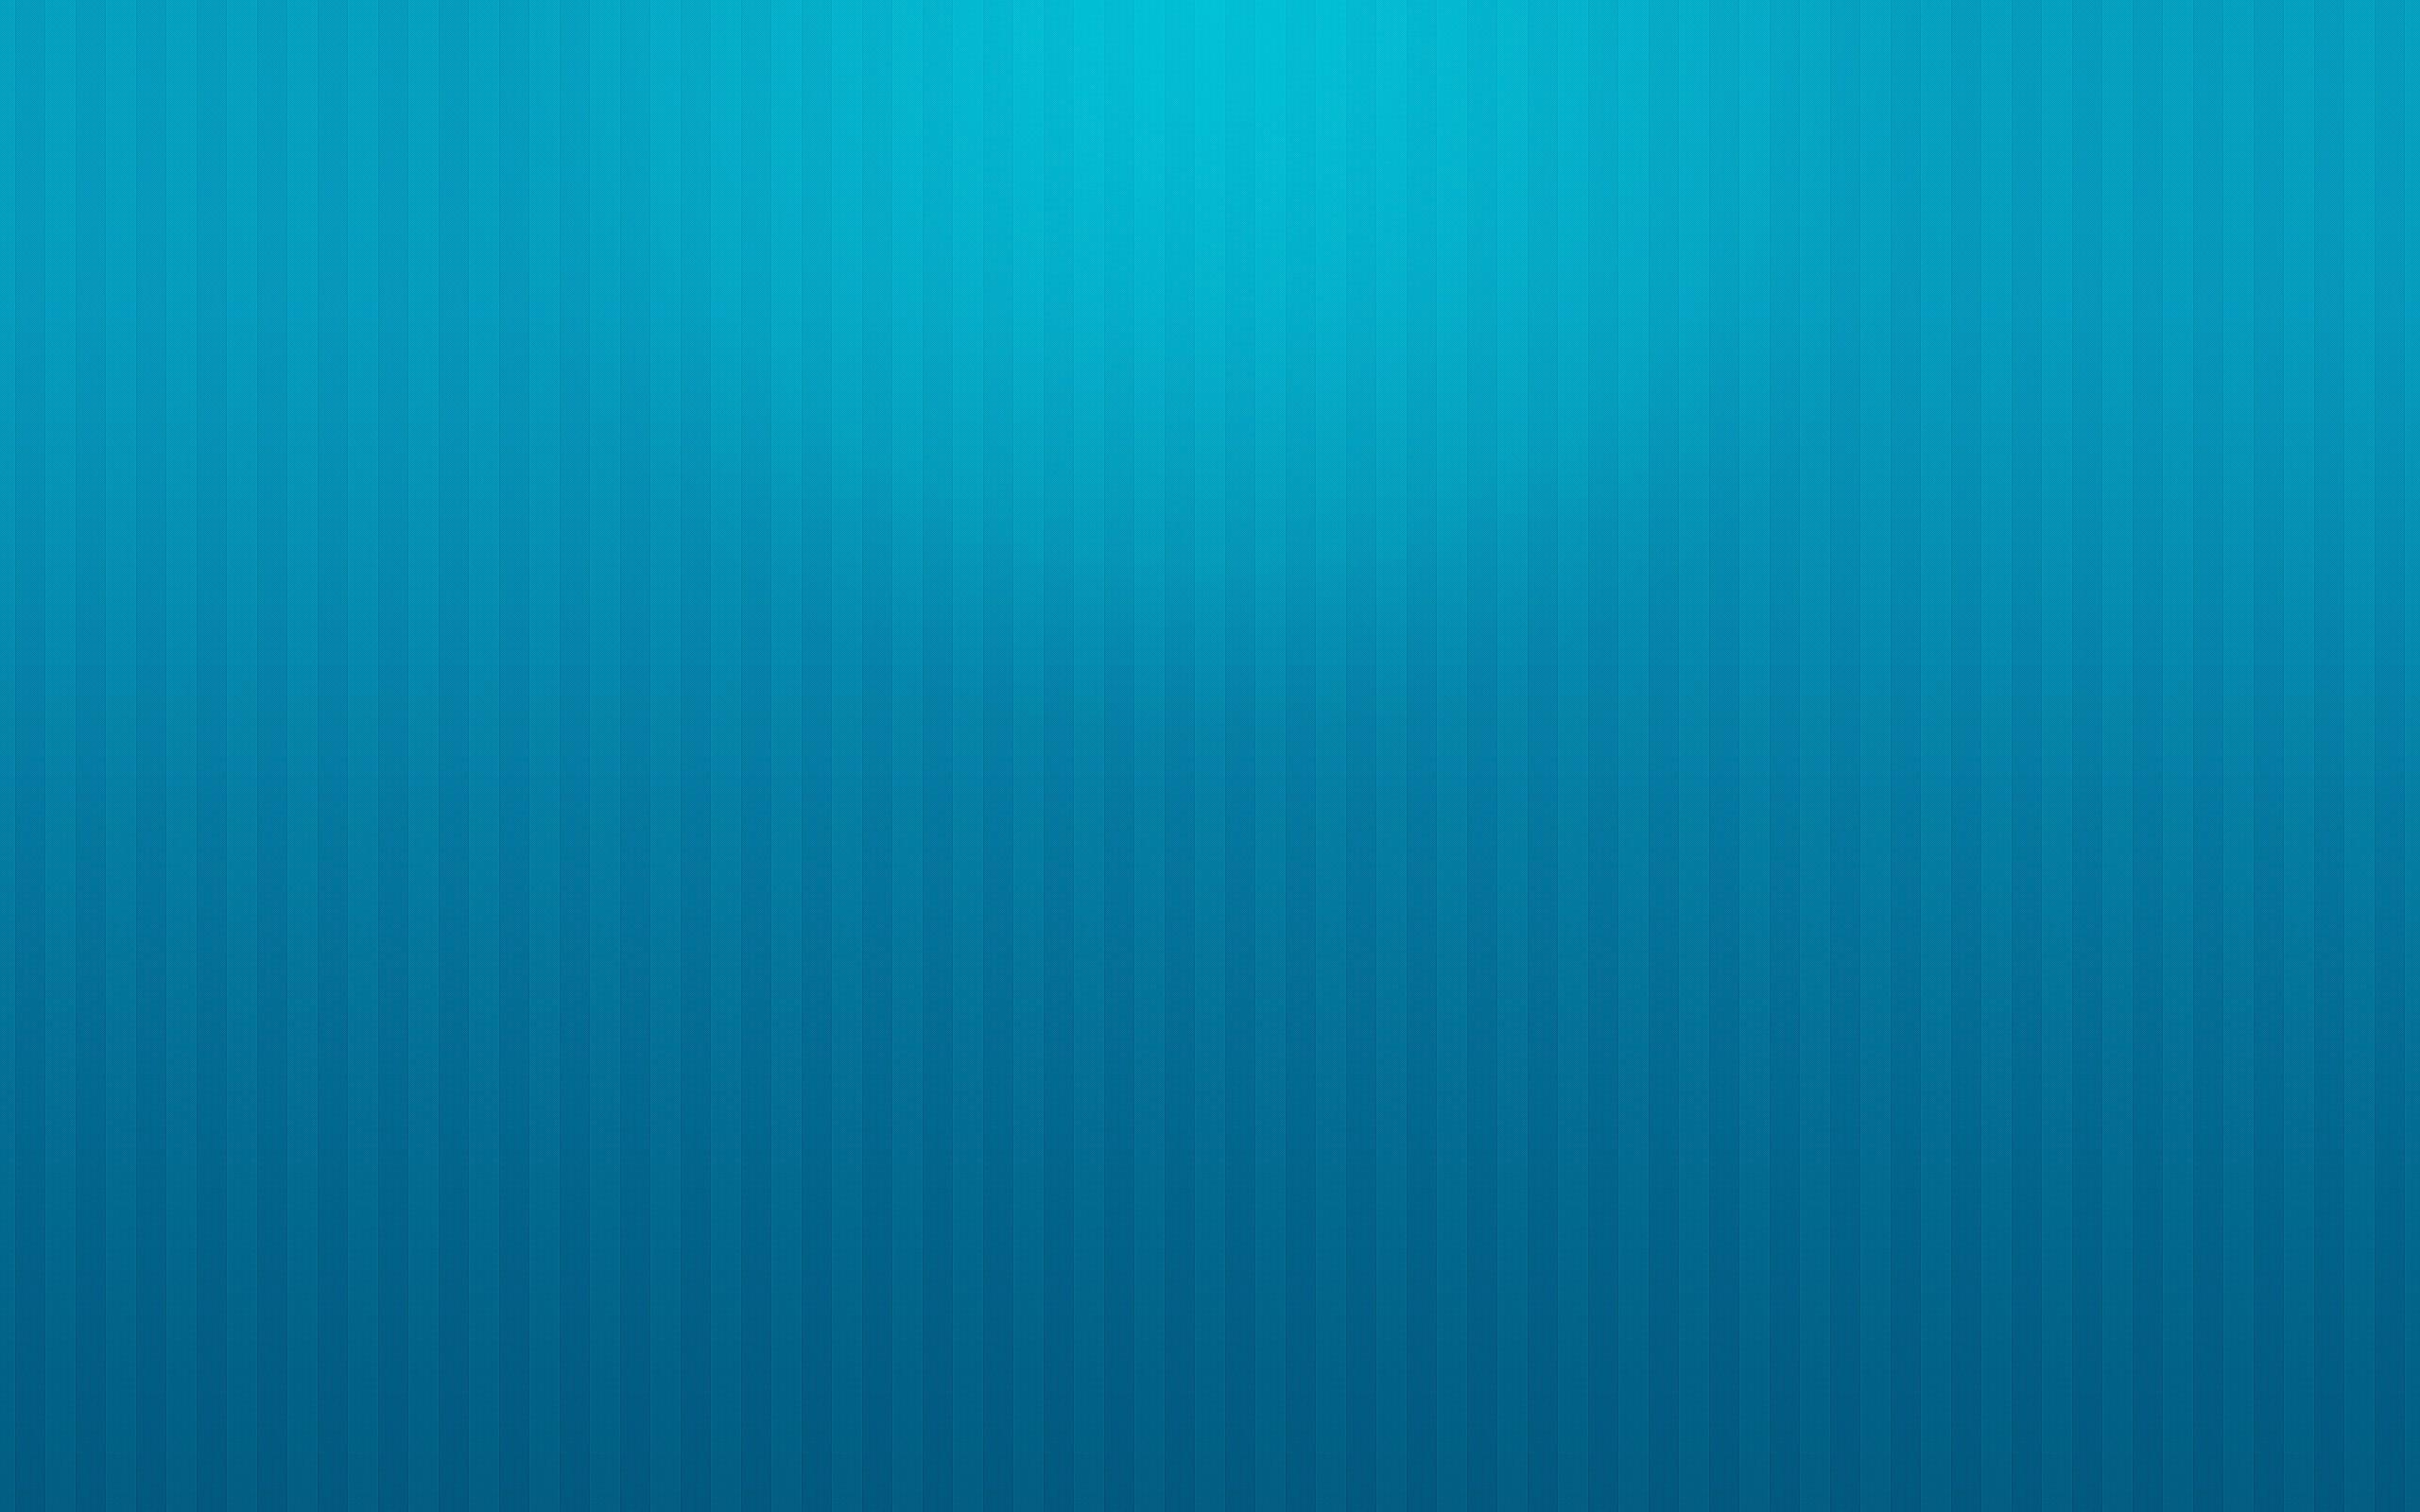 hinh nen mau xanh 64